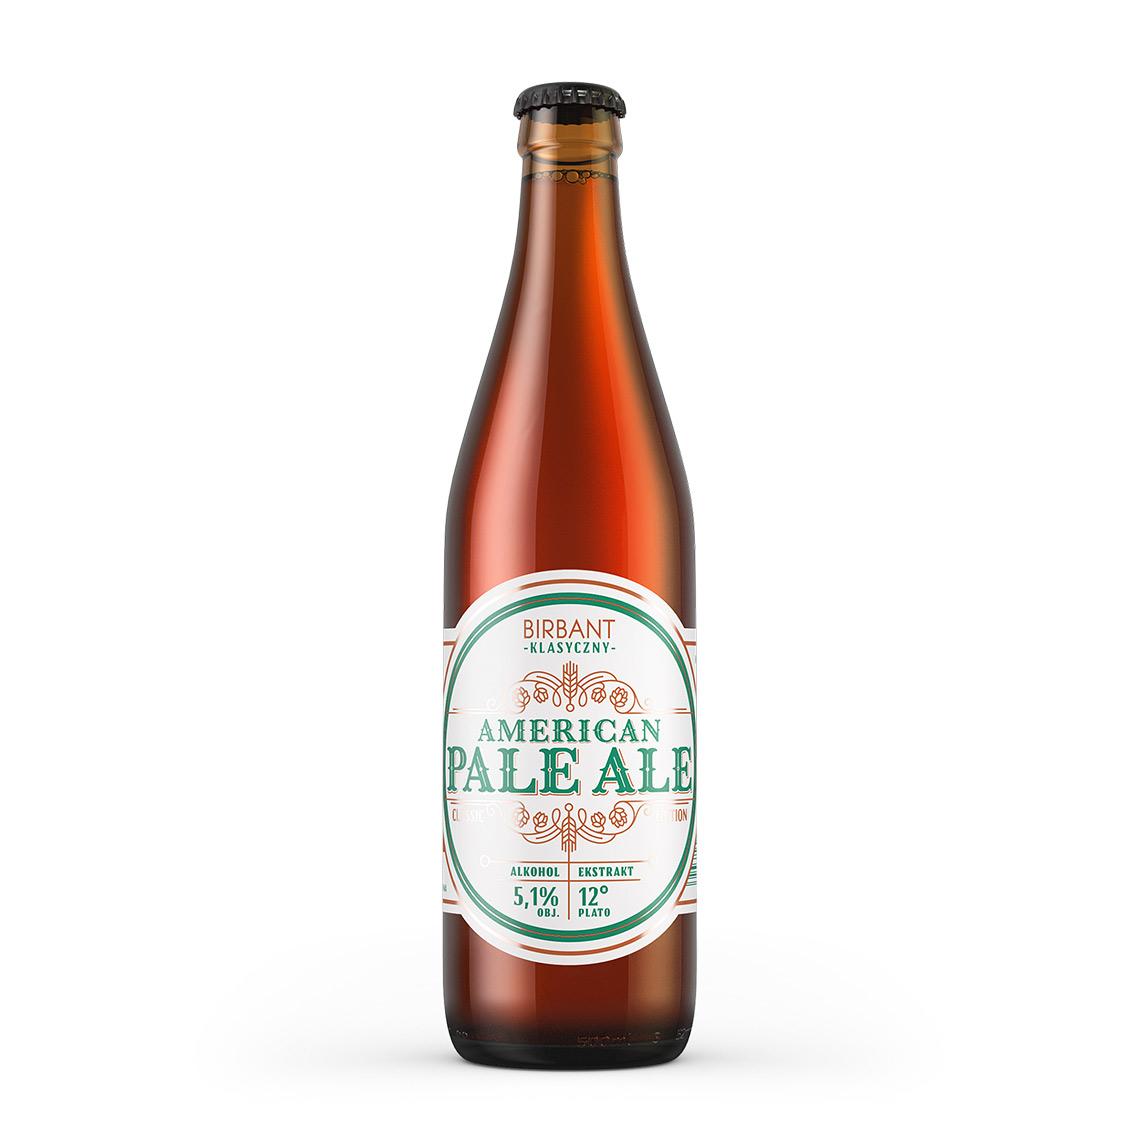 BIRBANT American Pale Ale classic